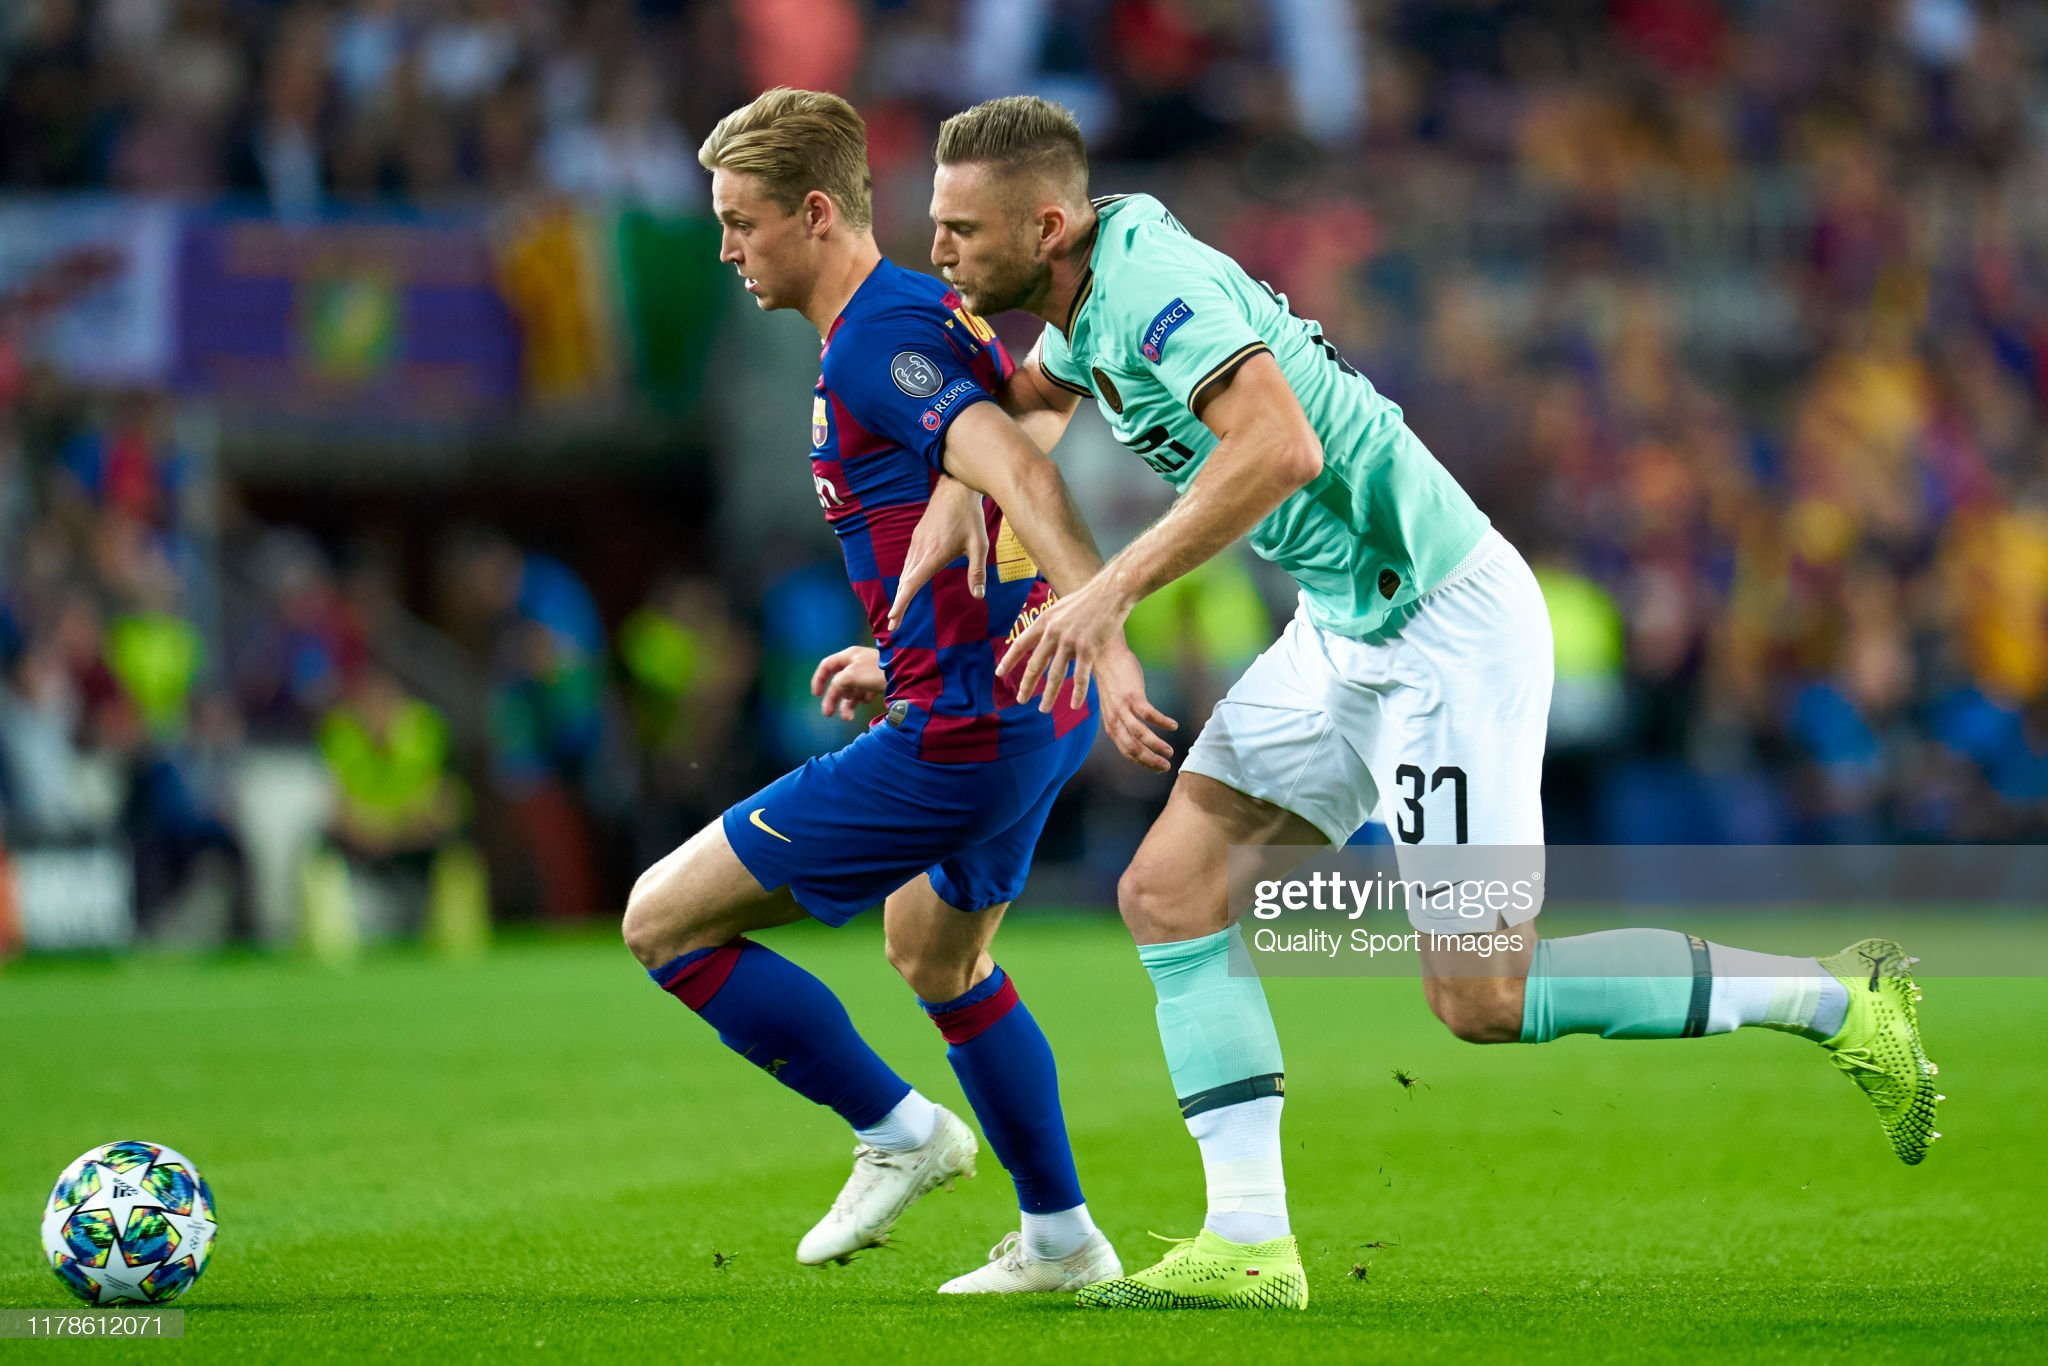 صور مباراة : برشلونة - إنتر 2-1 ( 02-10-2019 )  Frenkie-de-jong-of-fc-barcelona-competes-for-the-ball-with-milan-of-picture-id1178612071?s=2048x2048